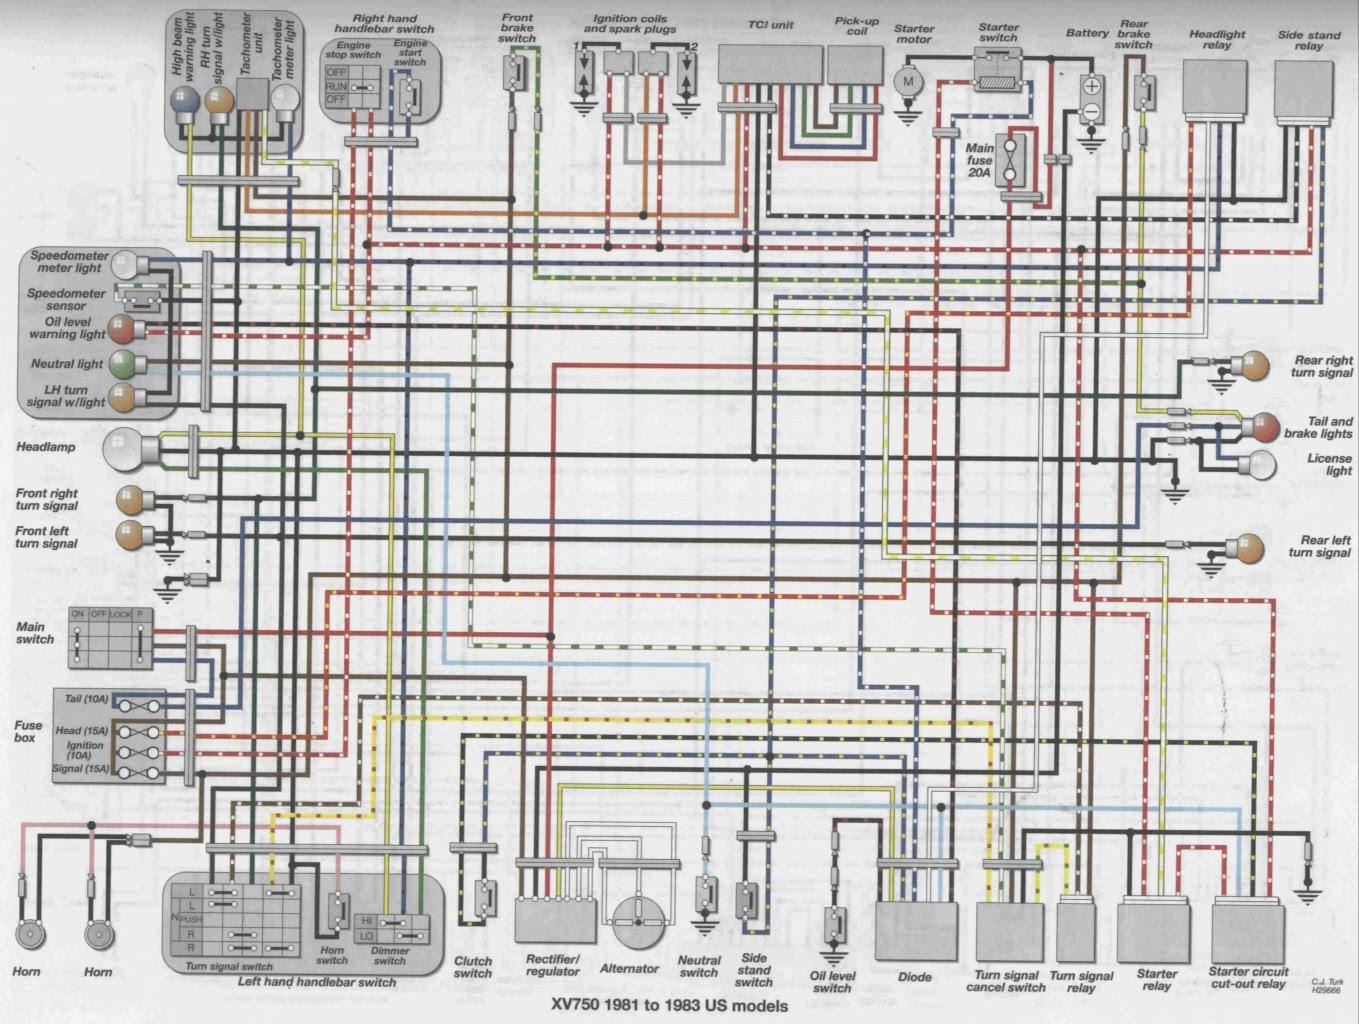 Wiring Diagram Xv750 - Home Wiring Diagram